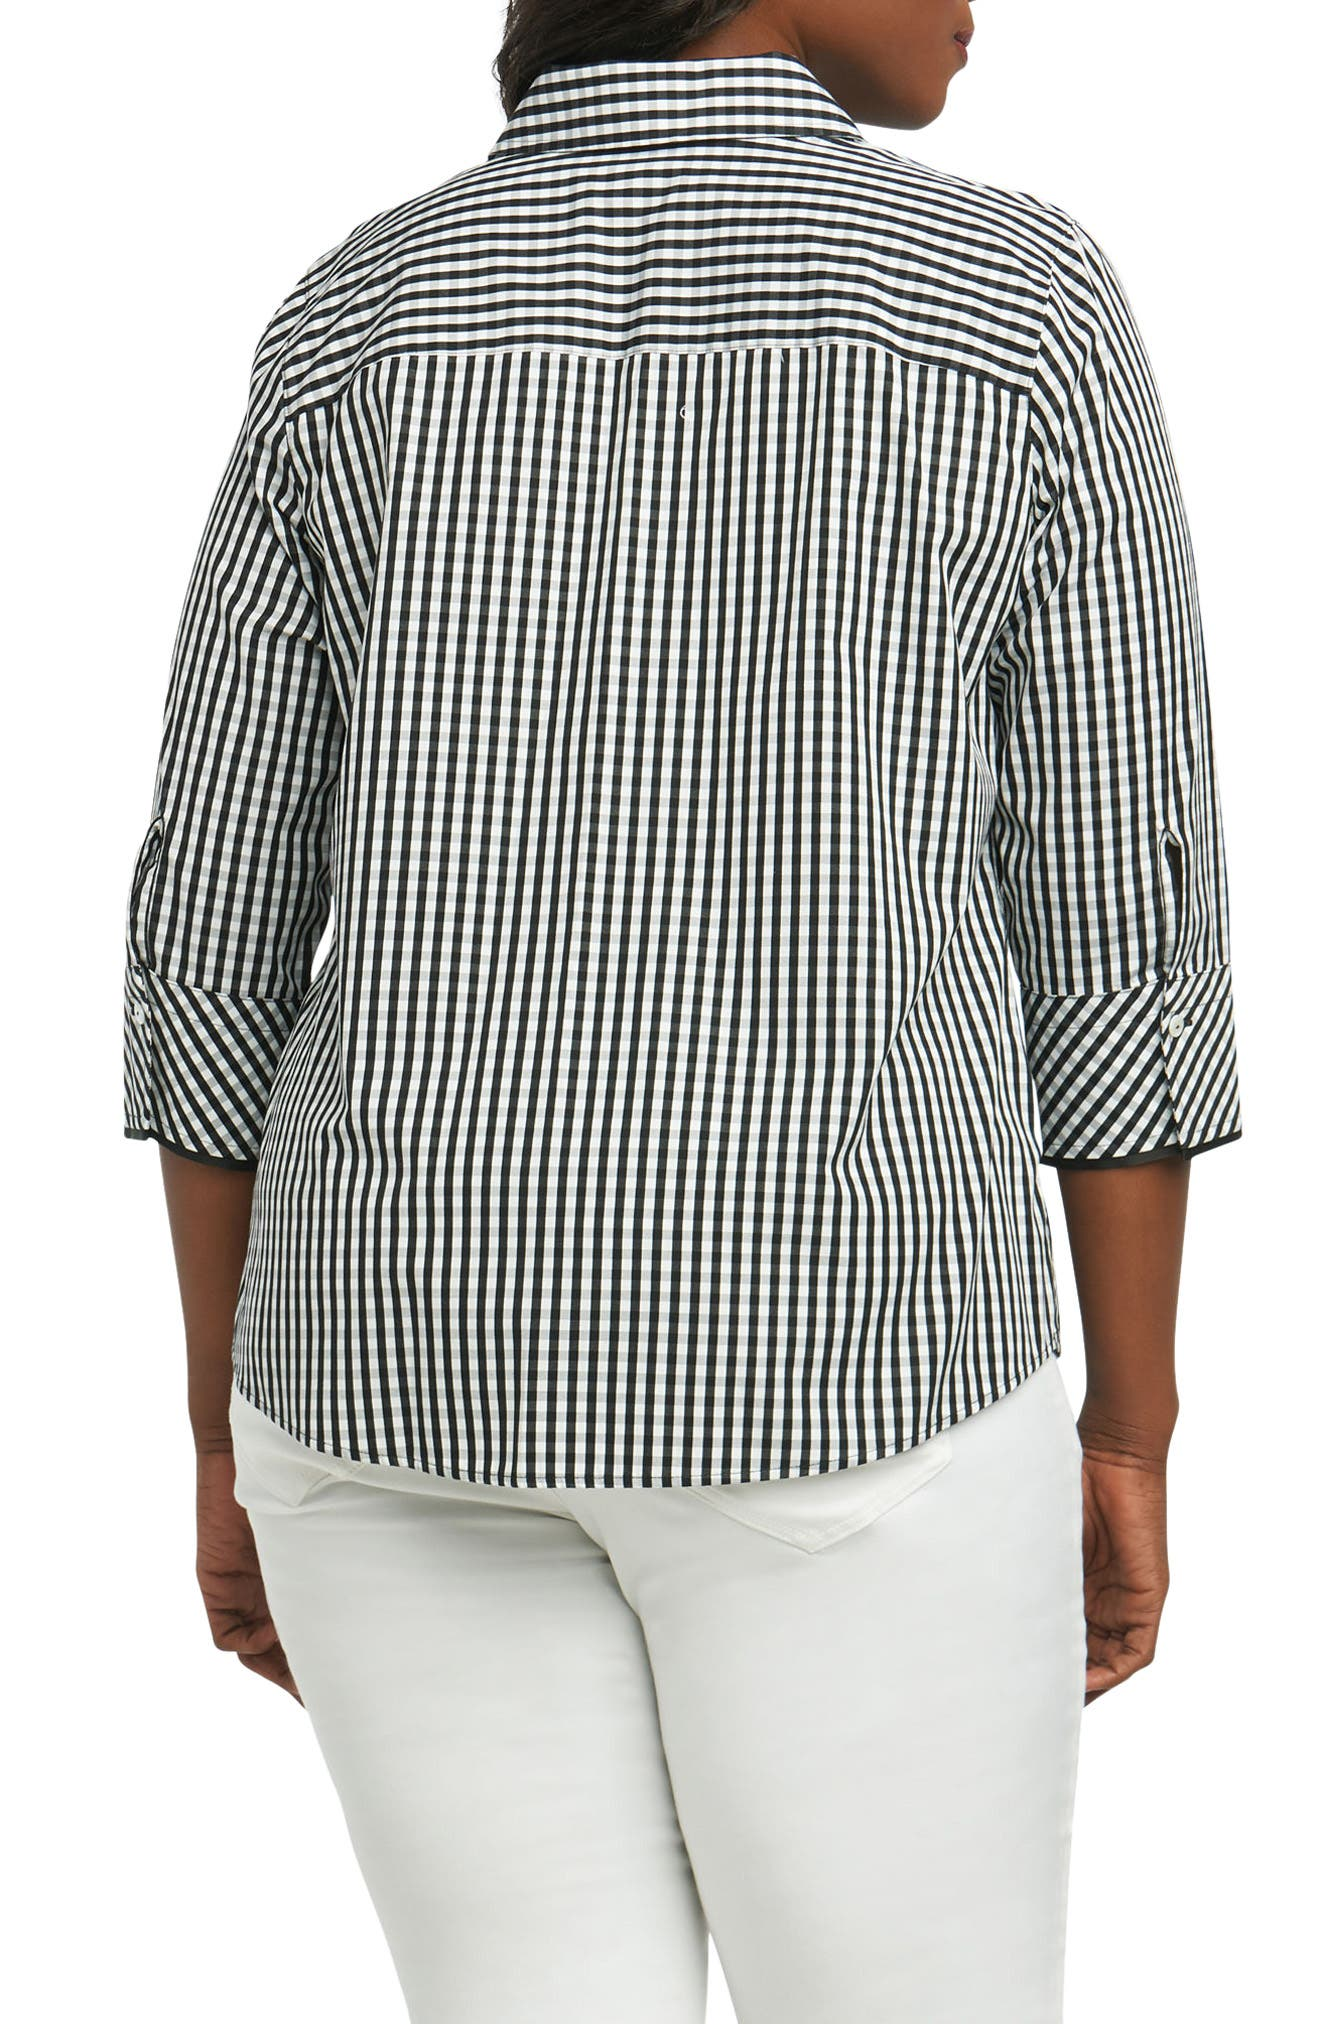 Mary Gingham Wrinkle Free Shirt,                             Alternate thumbnail 2, color,                             002